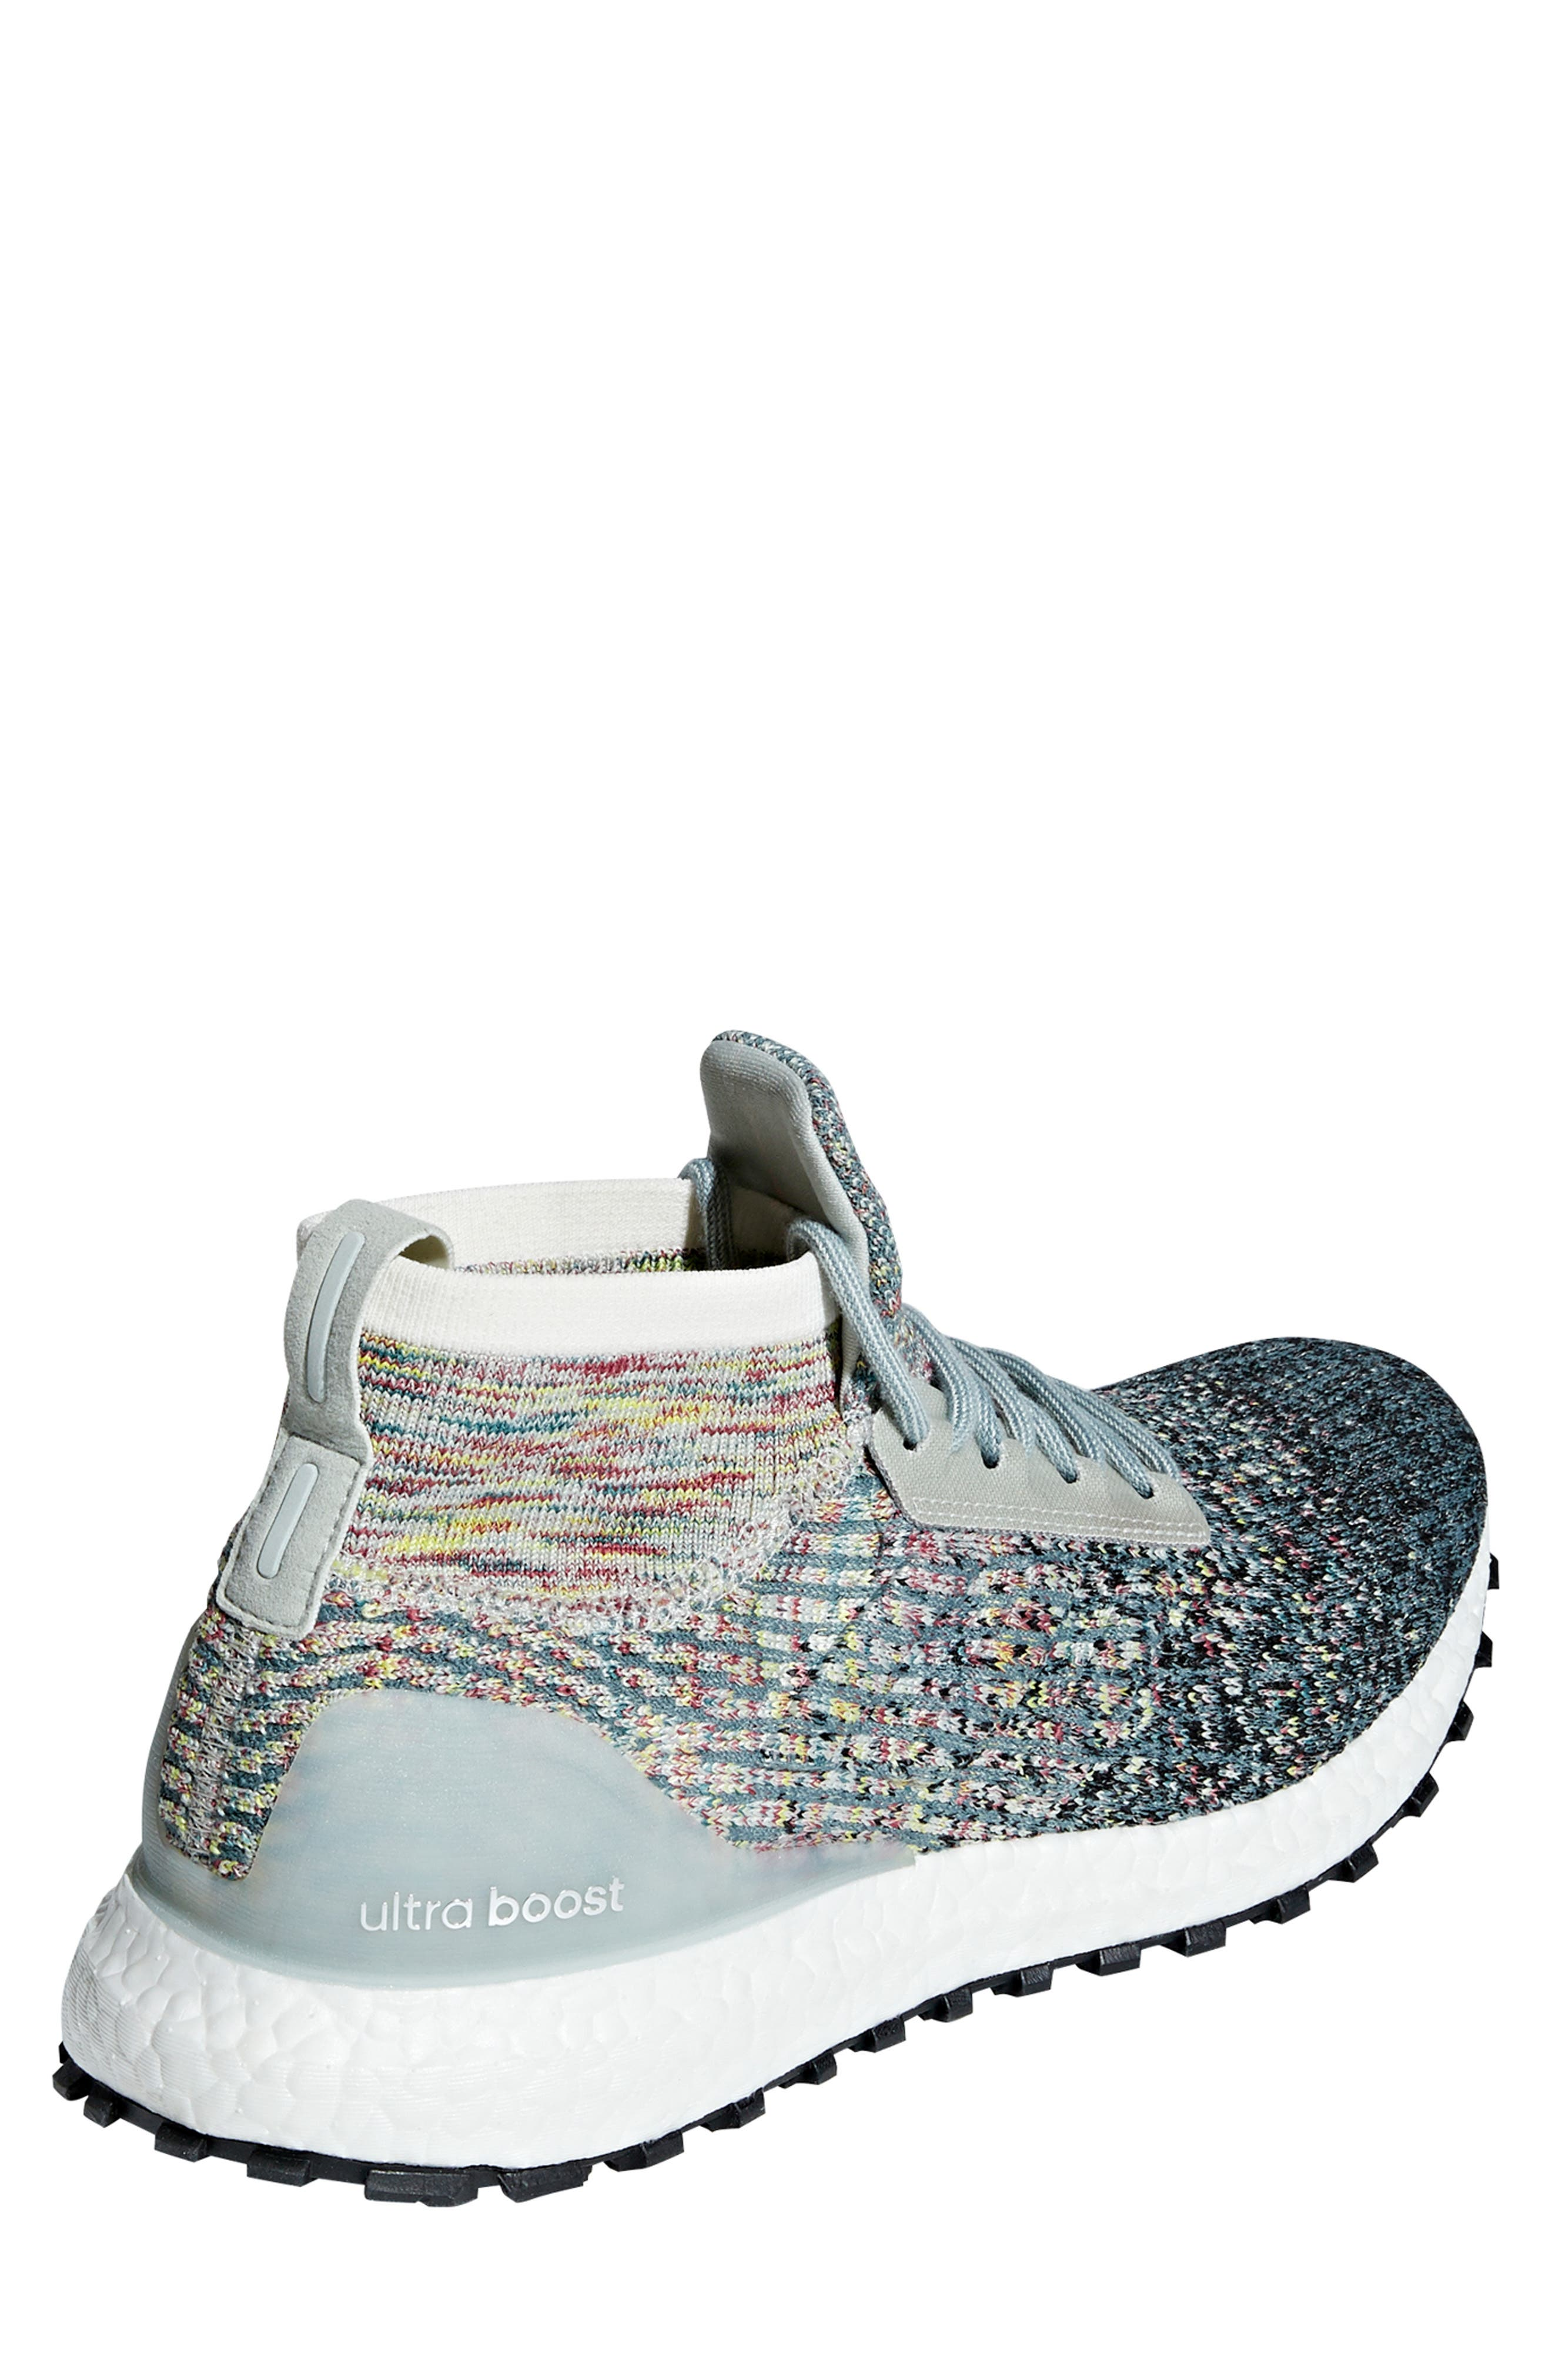 UltraBoost All Terrain LTD Running Shoe,                             Alternate thumbnail 2, color,                             ASH SILVER/ CARBON/ BLACK